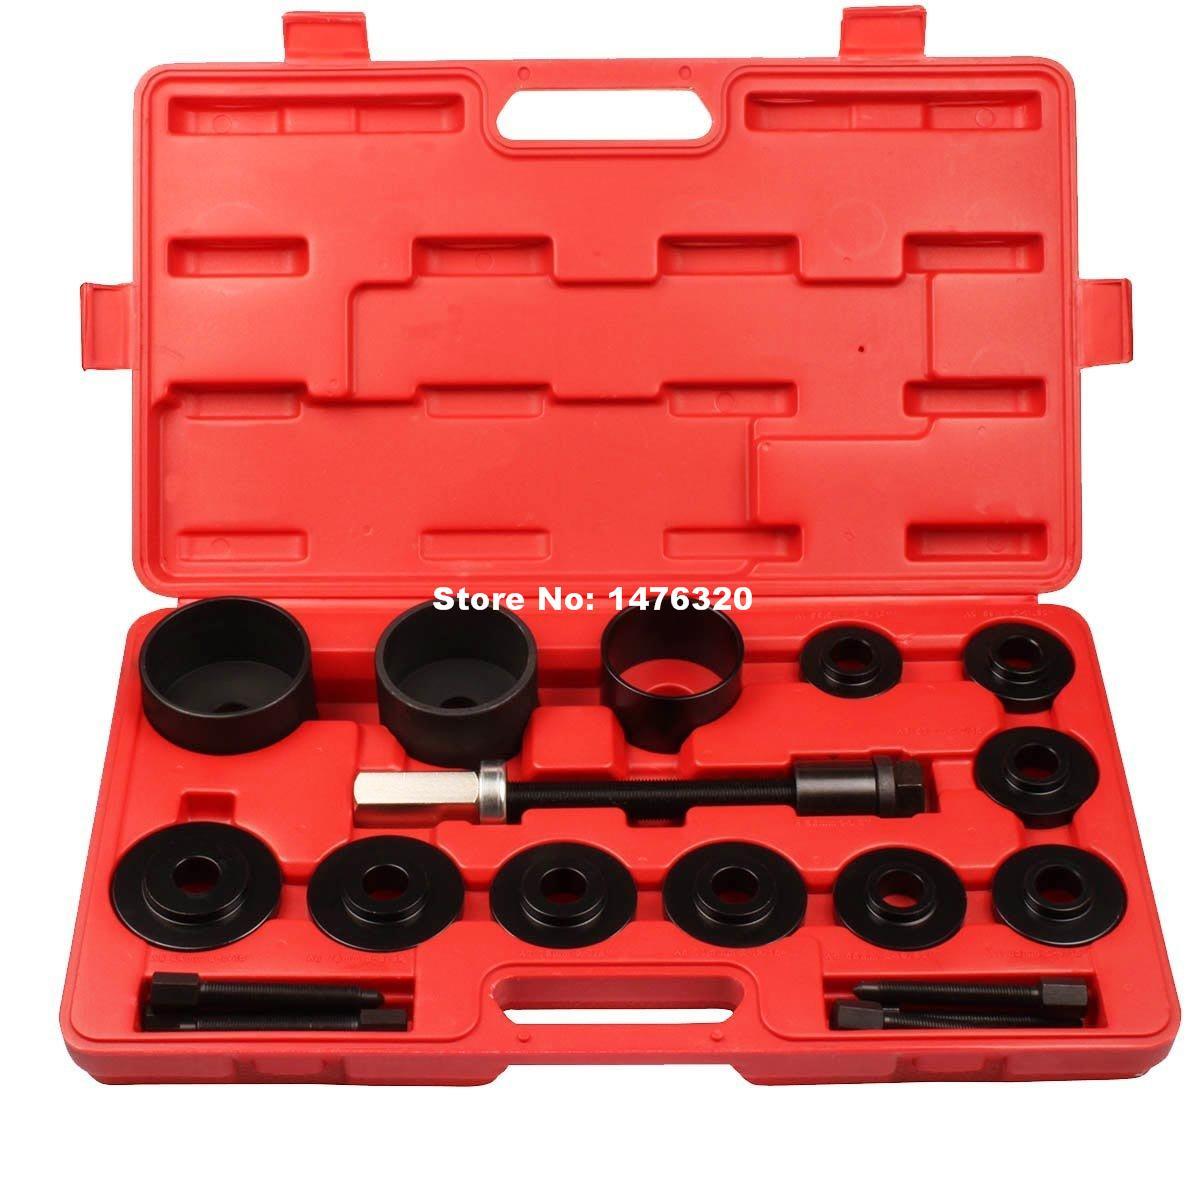 Universal Car Front Wheel Drive Hub Bearing Instatllation Removal Repair Garage Tool Kit AT2012 19pcs master front wheel hub drive bearing removal install service tool kit